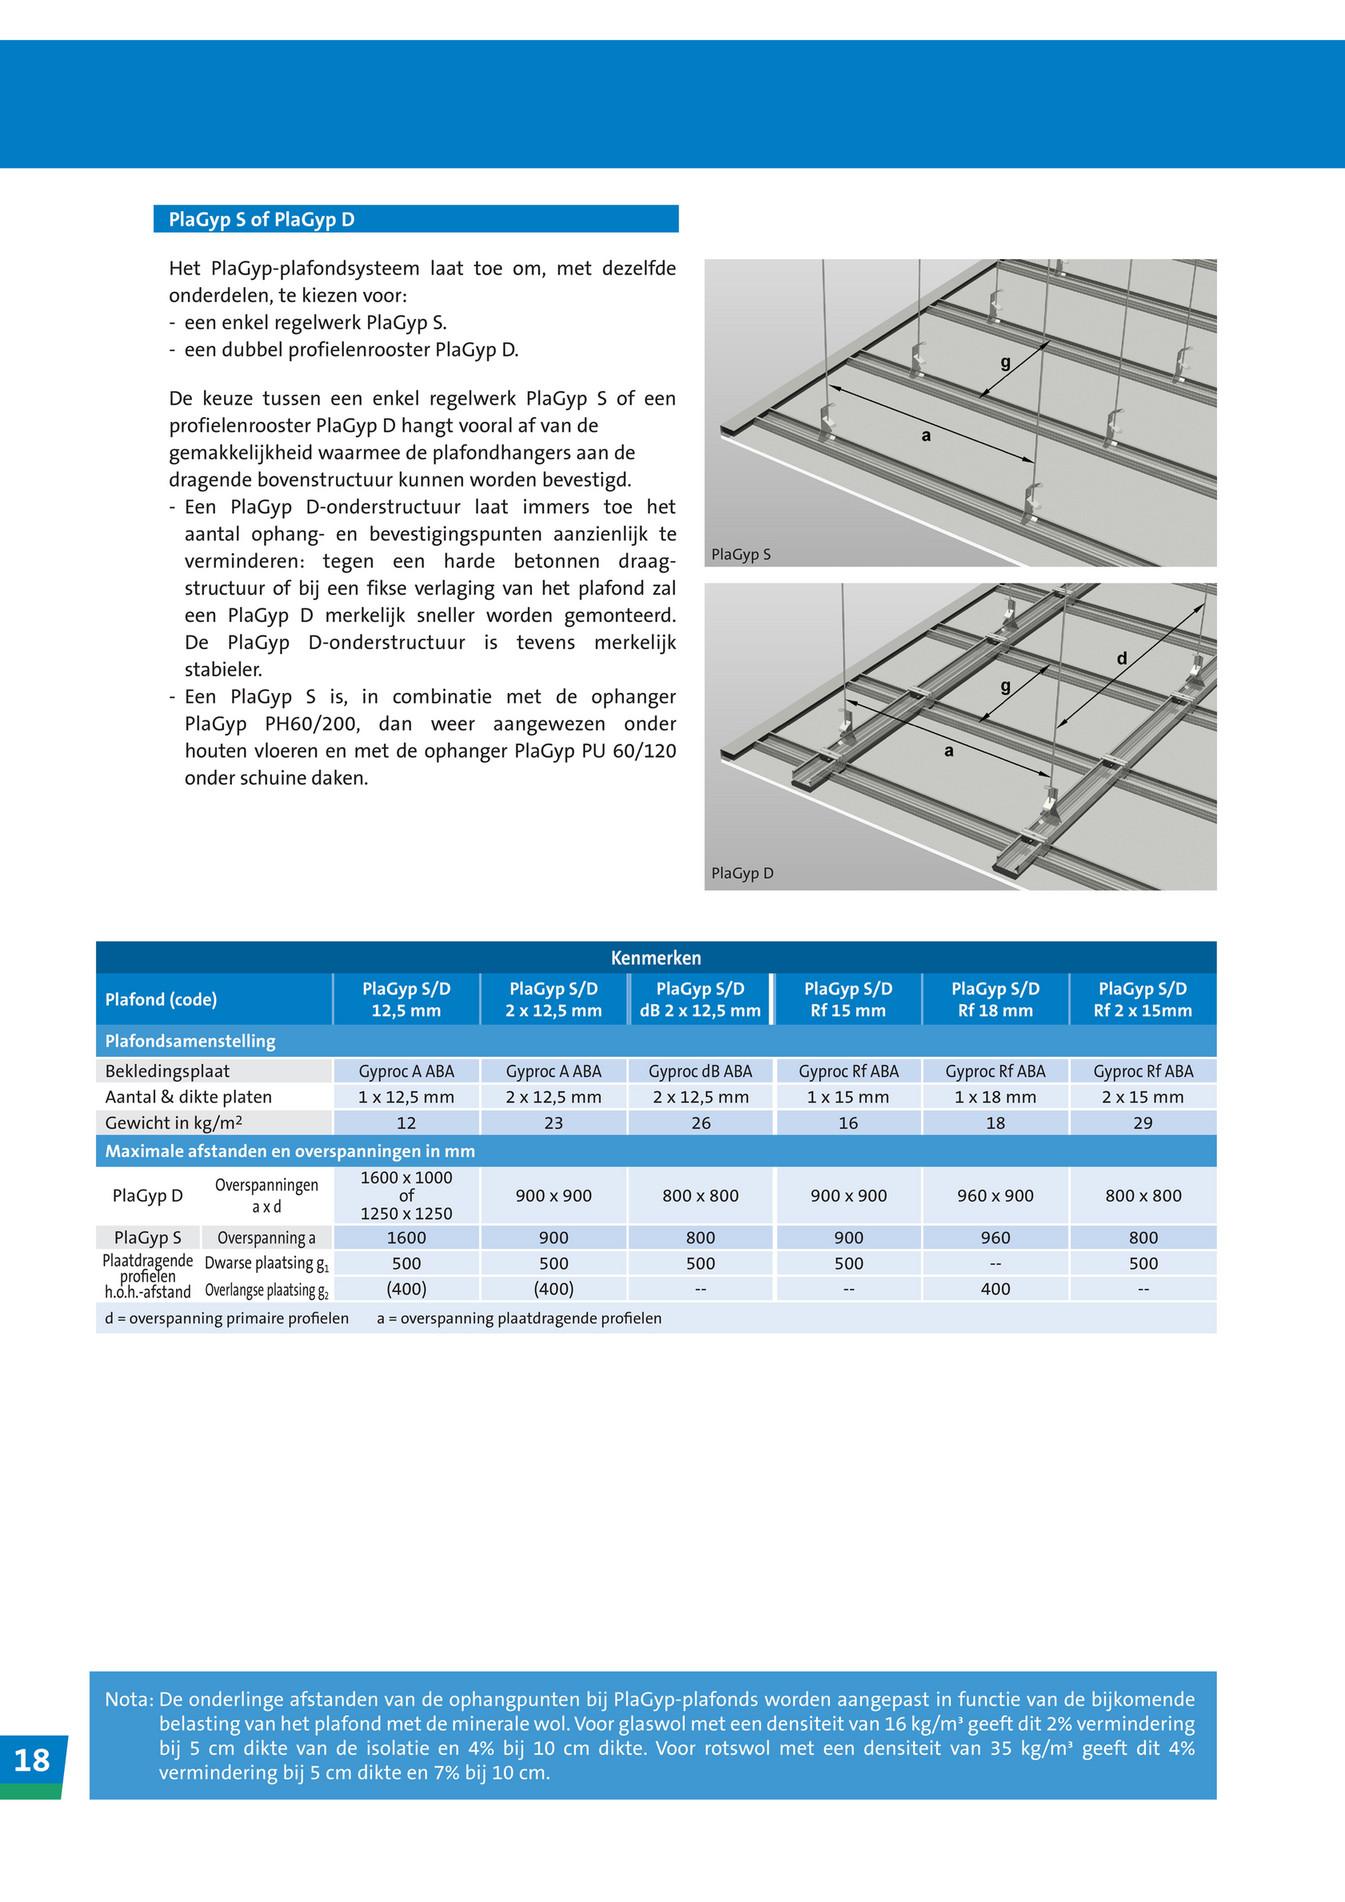 Gyproc plafondsystemen nl pagina 18 19 - 1m2 en cm ...